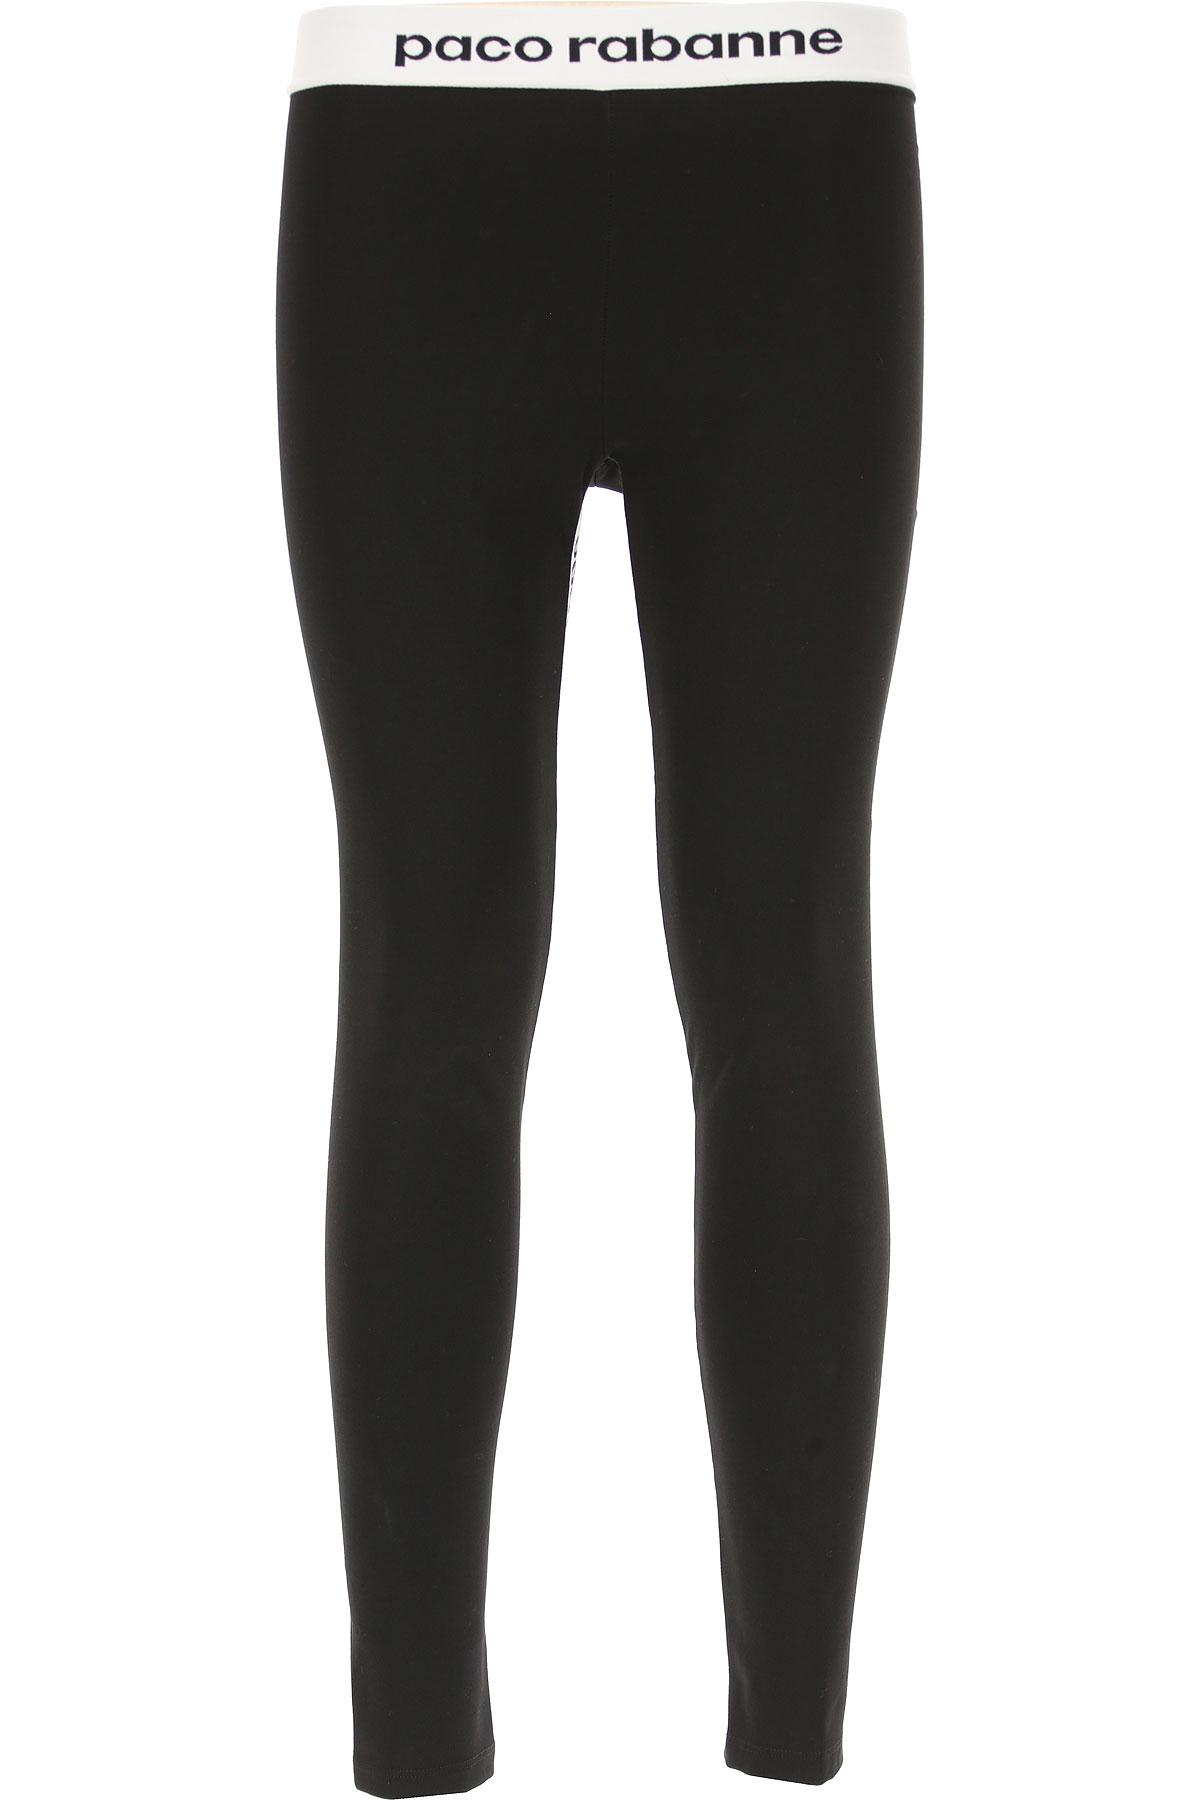 Paco Rabanne Pantalon Femme, Noir, Viscose, 2017, 40 42